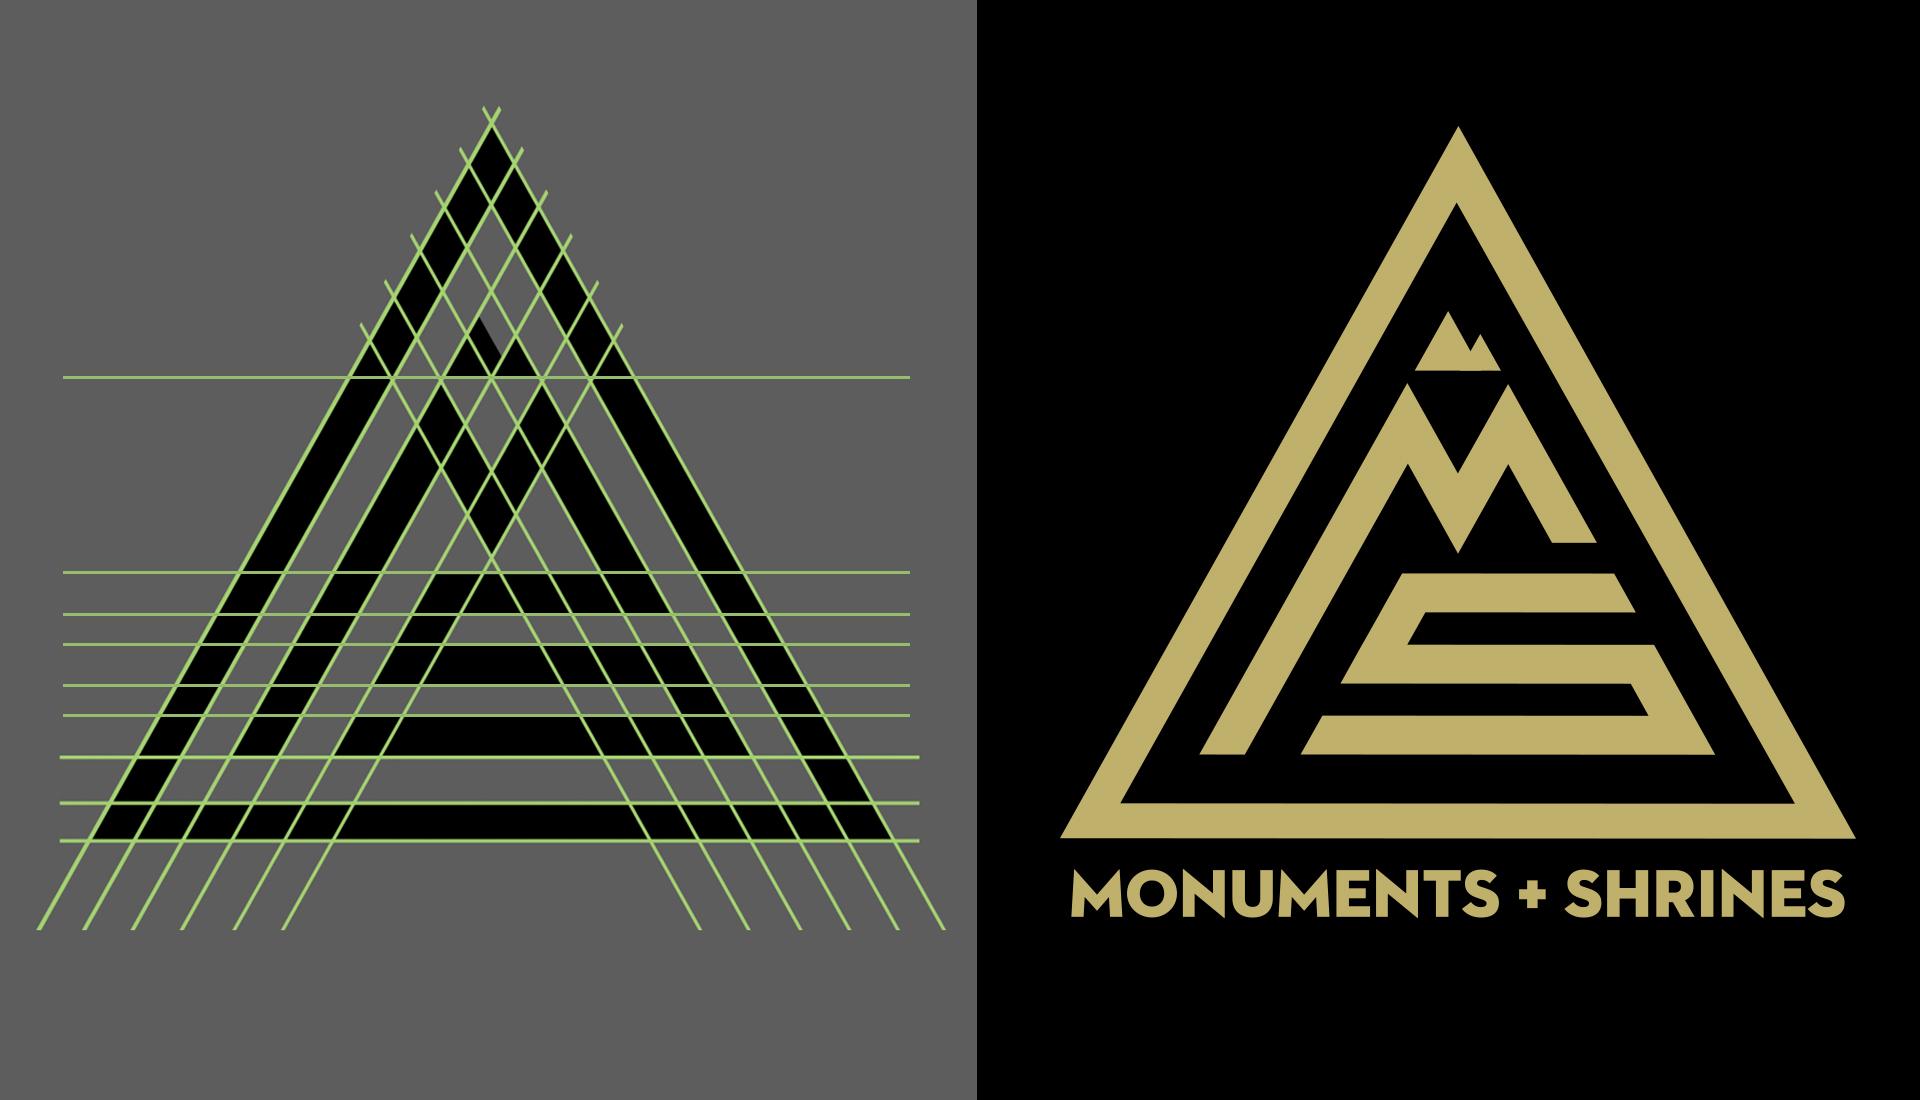 1920x1100-Monuments-Shrines.jpg